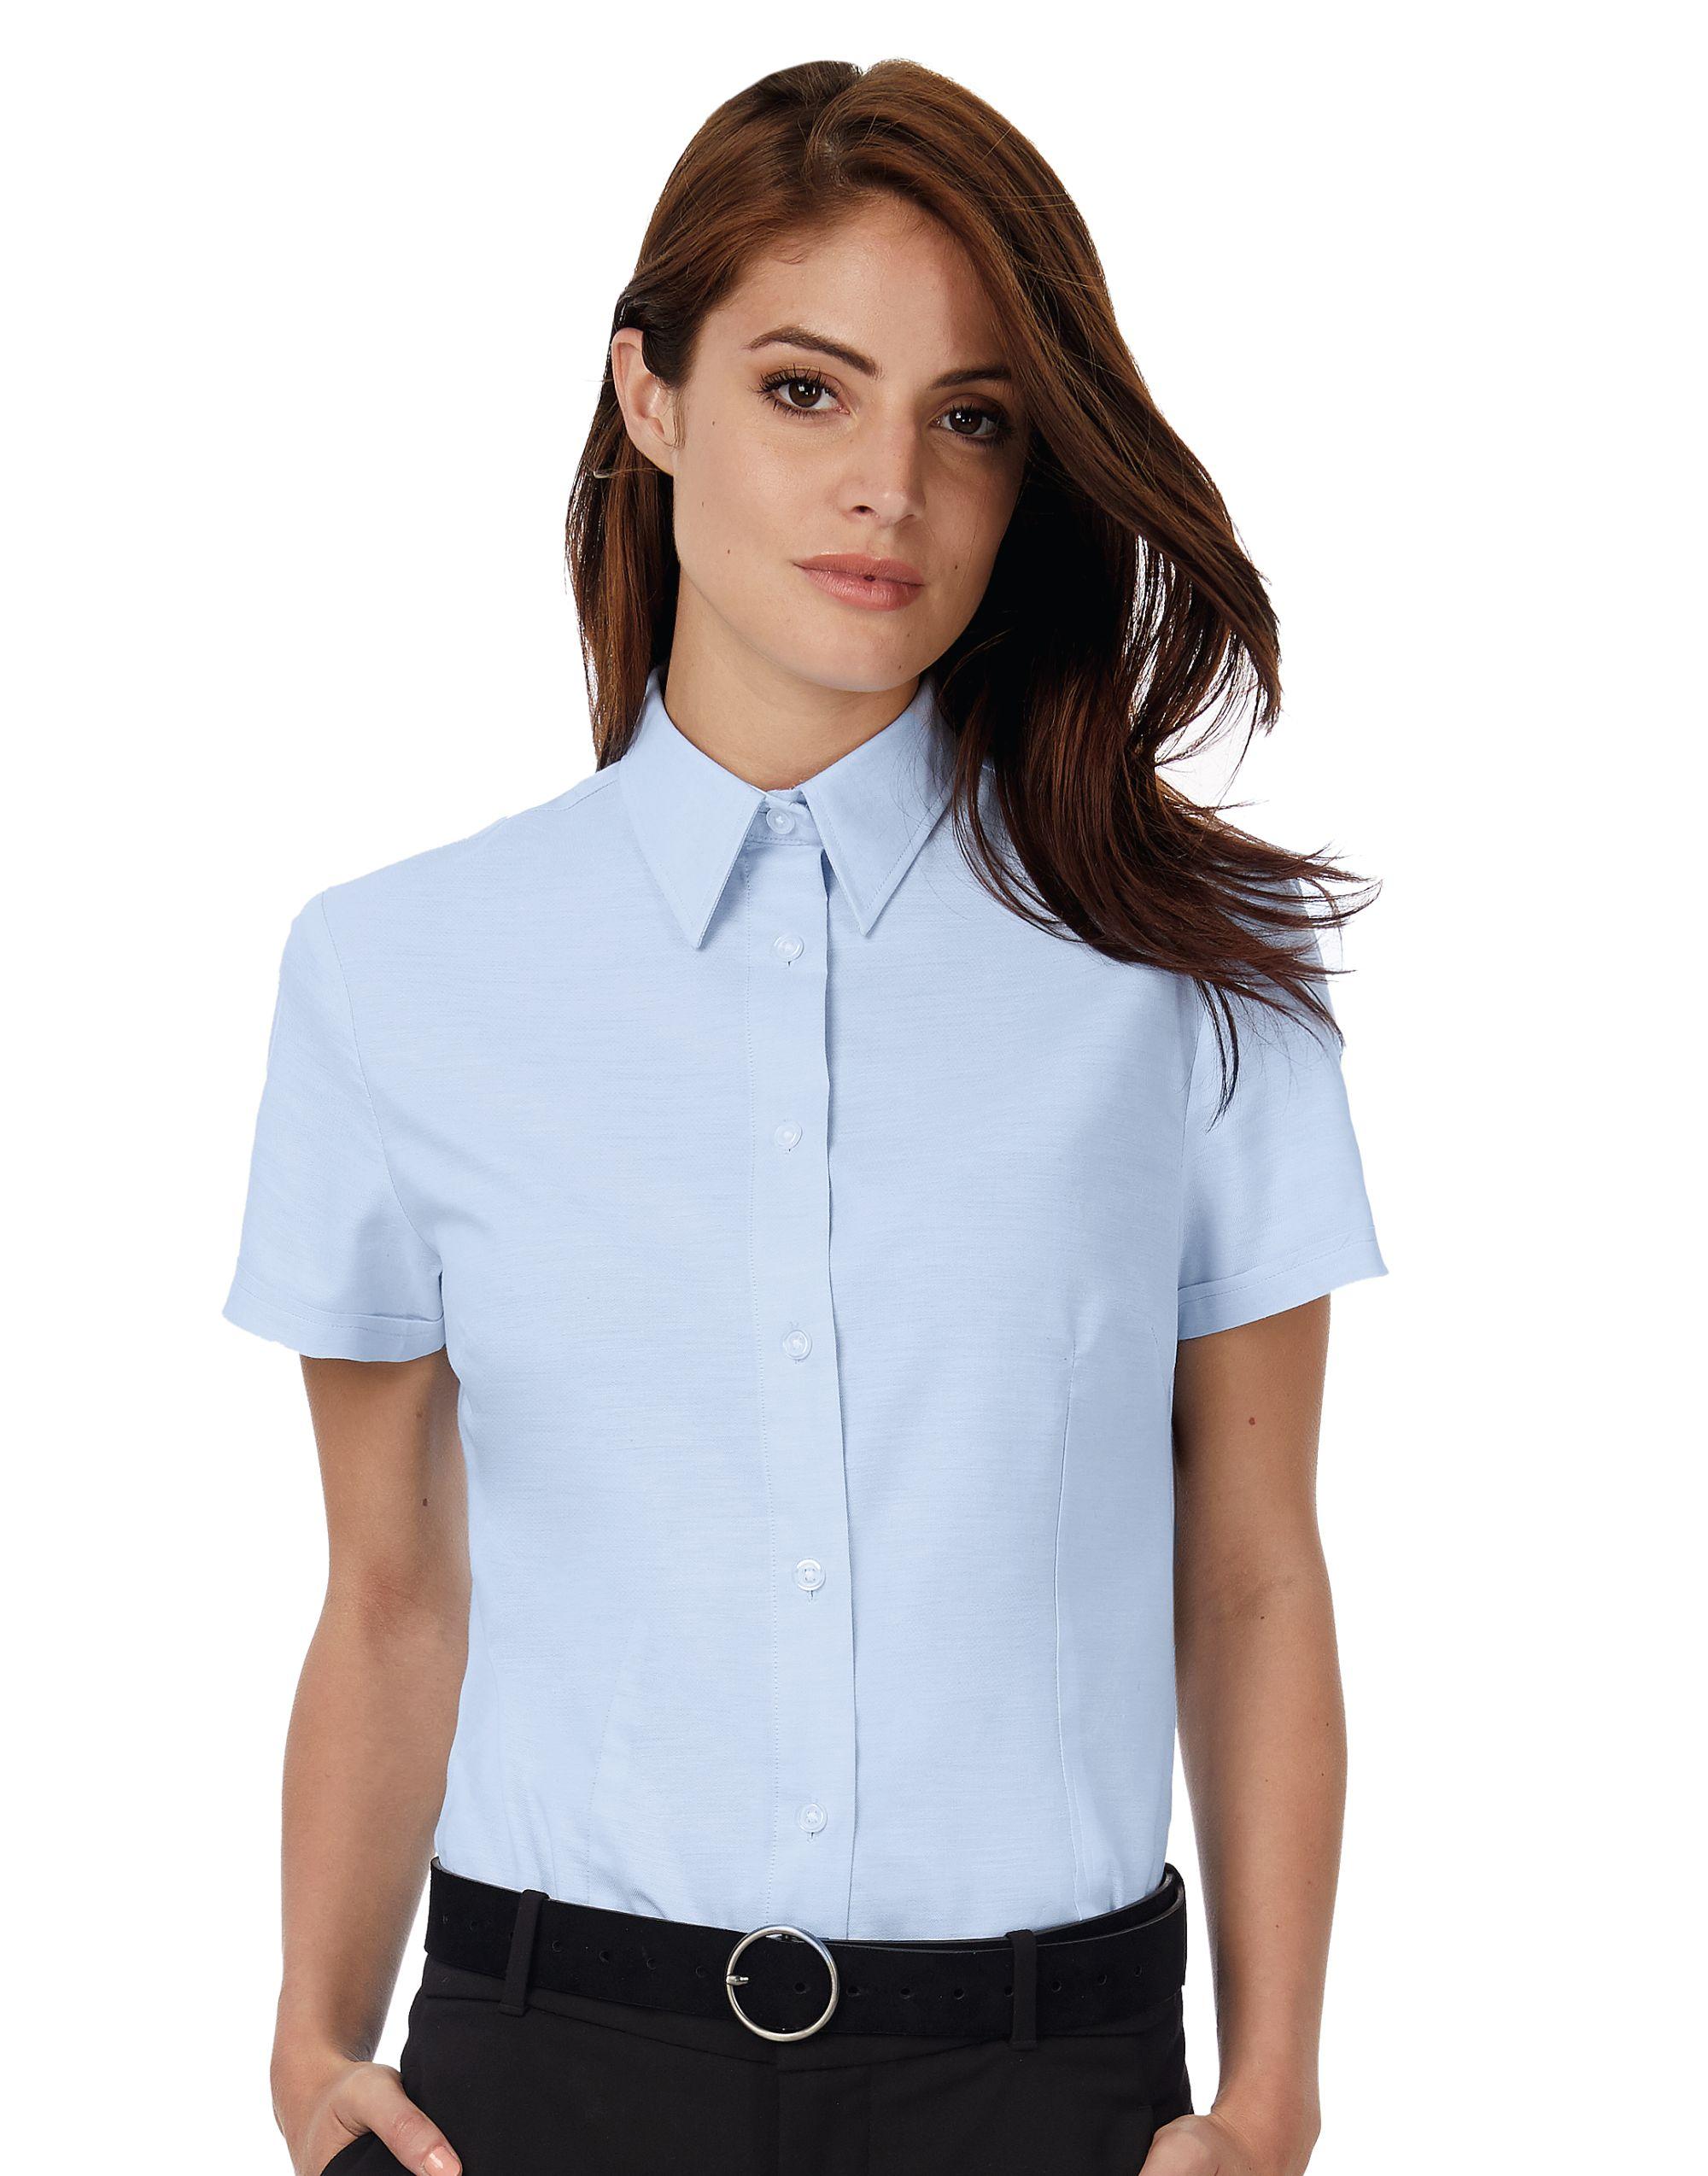 B&C Women's Oxford Short Sleeve Shirt